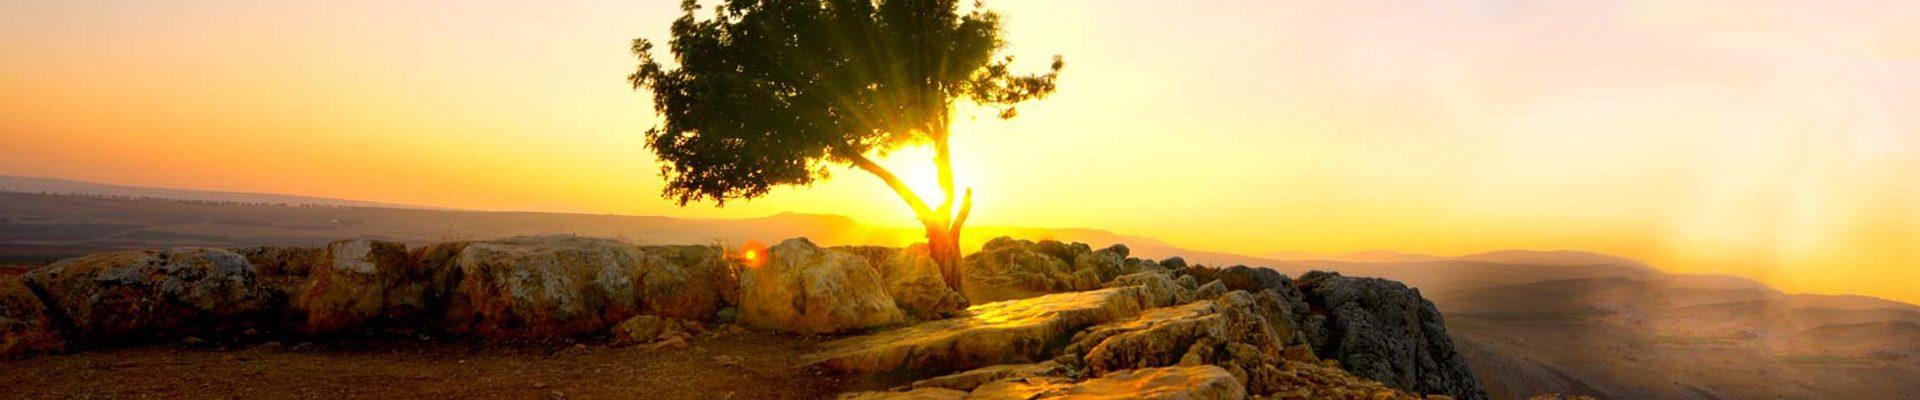 Israel-Family-Journey_Sunrise